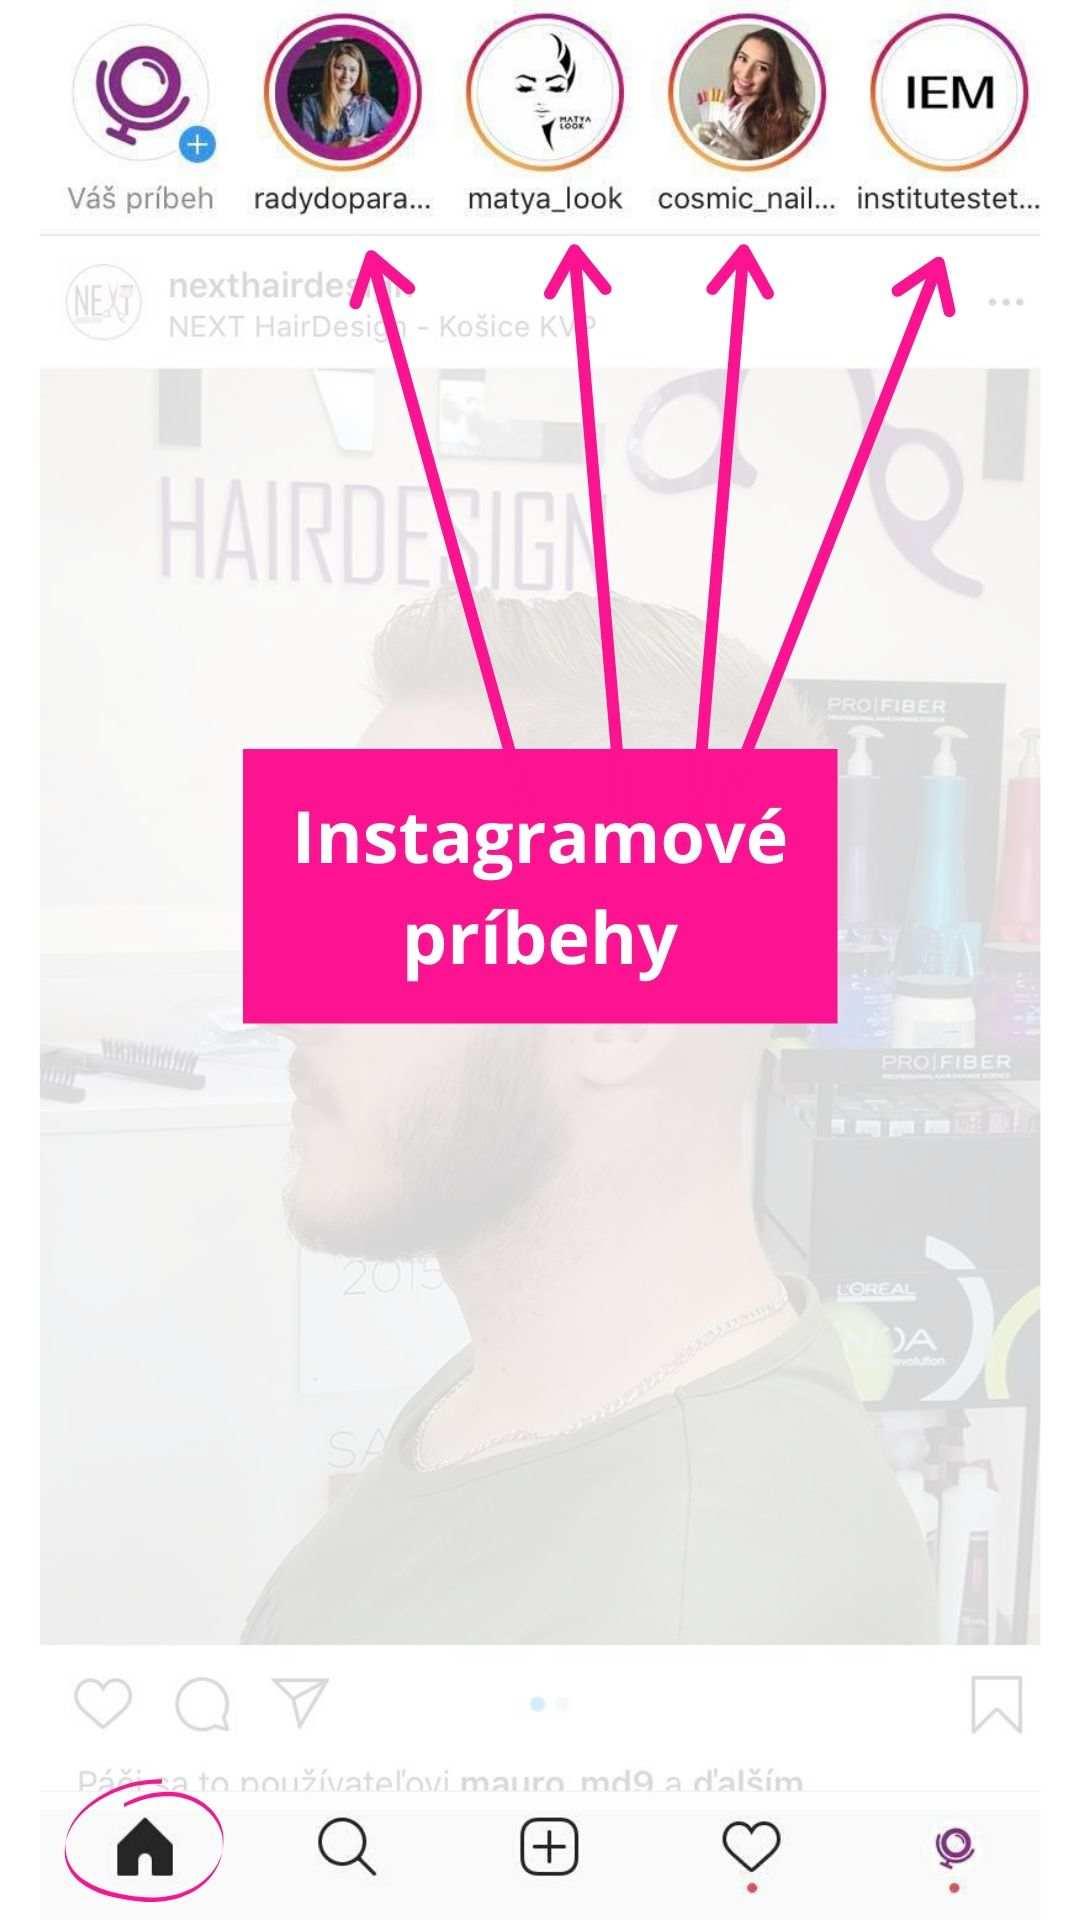 Základné pojmy Instagramu - Instagram Stories